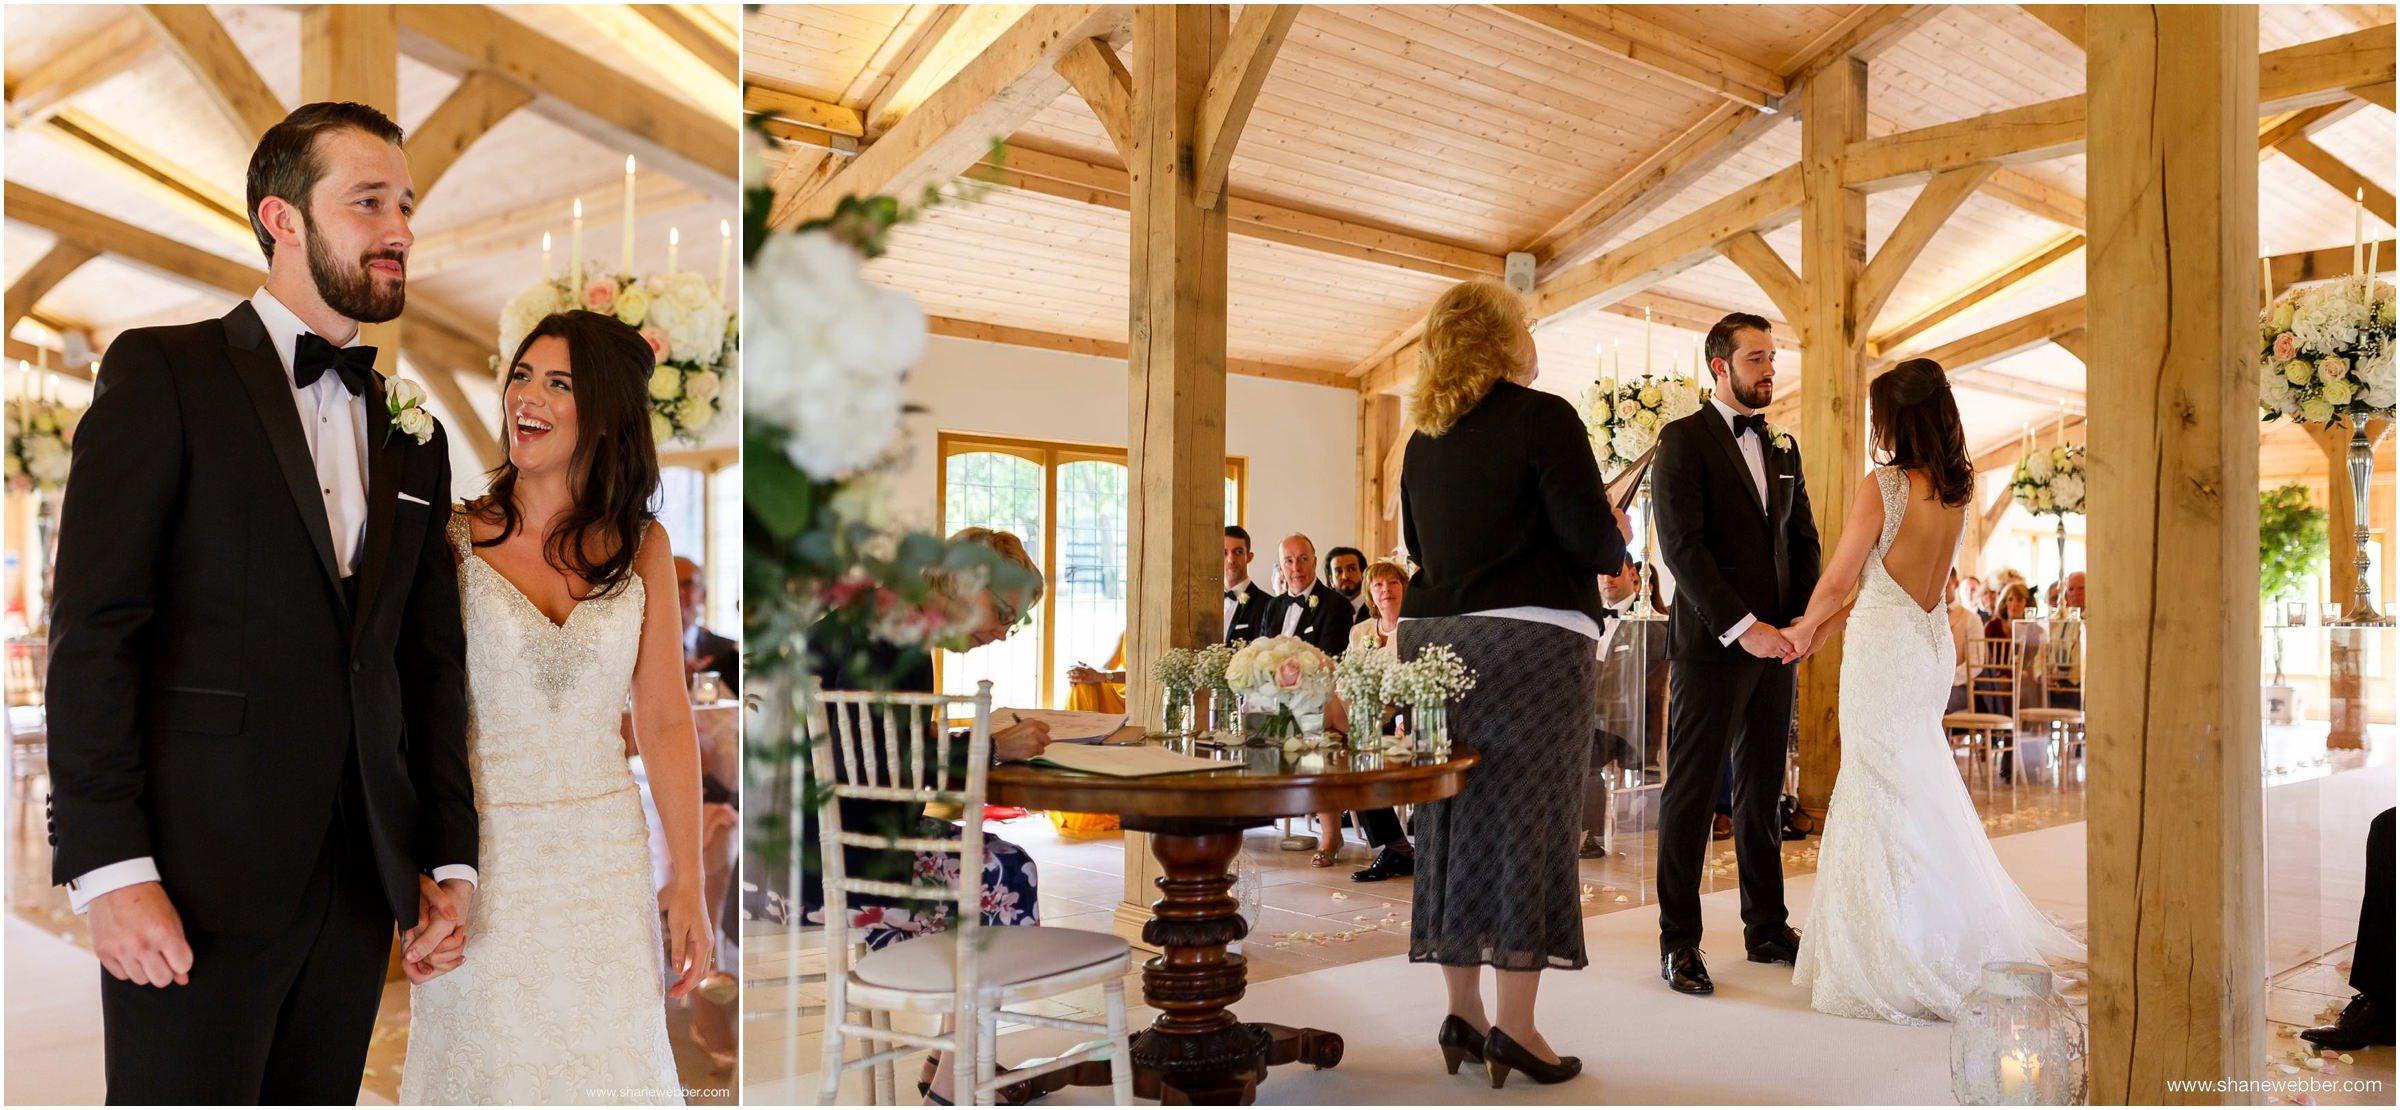 Wedding ceremony at Colshaw Hall